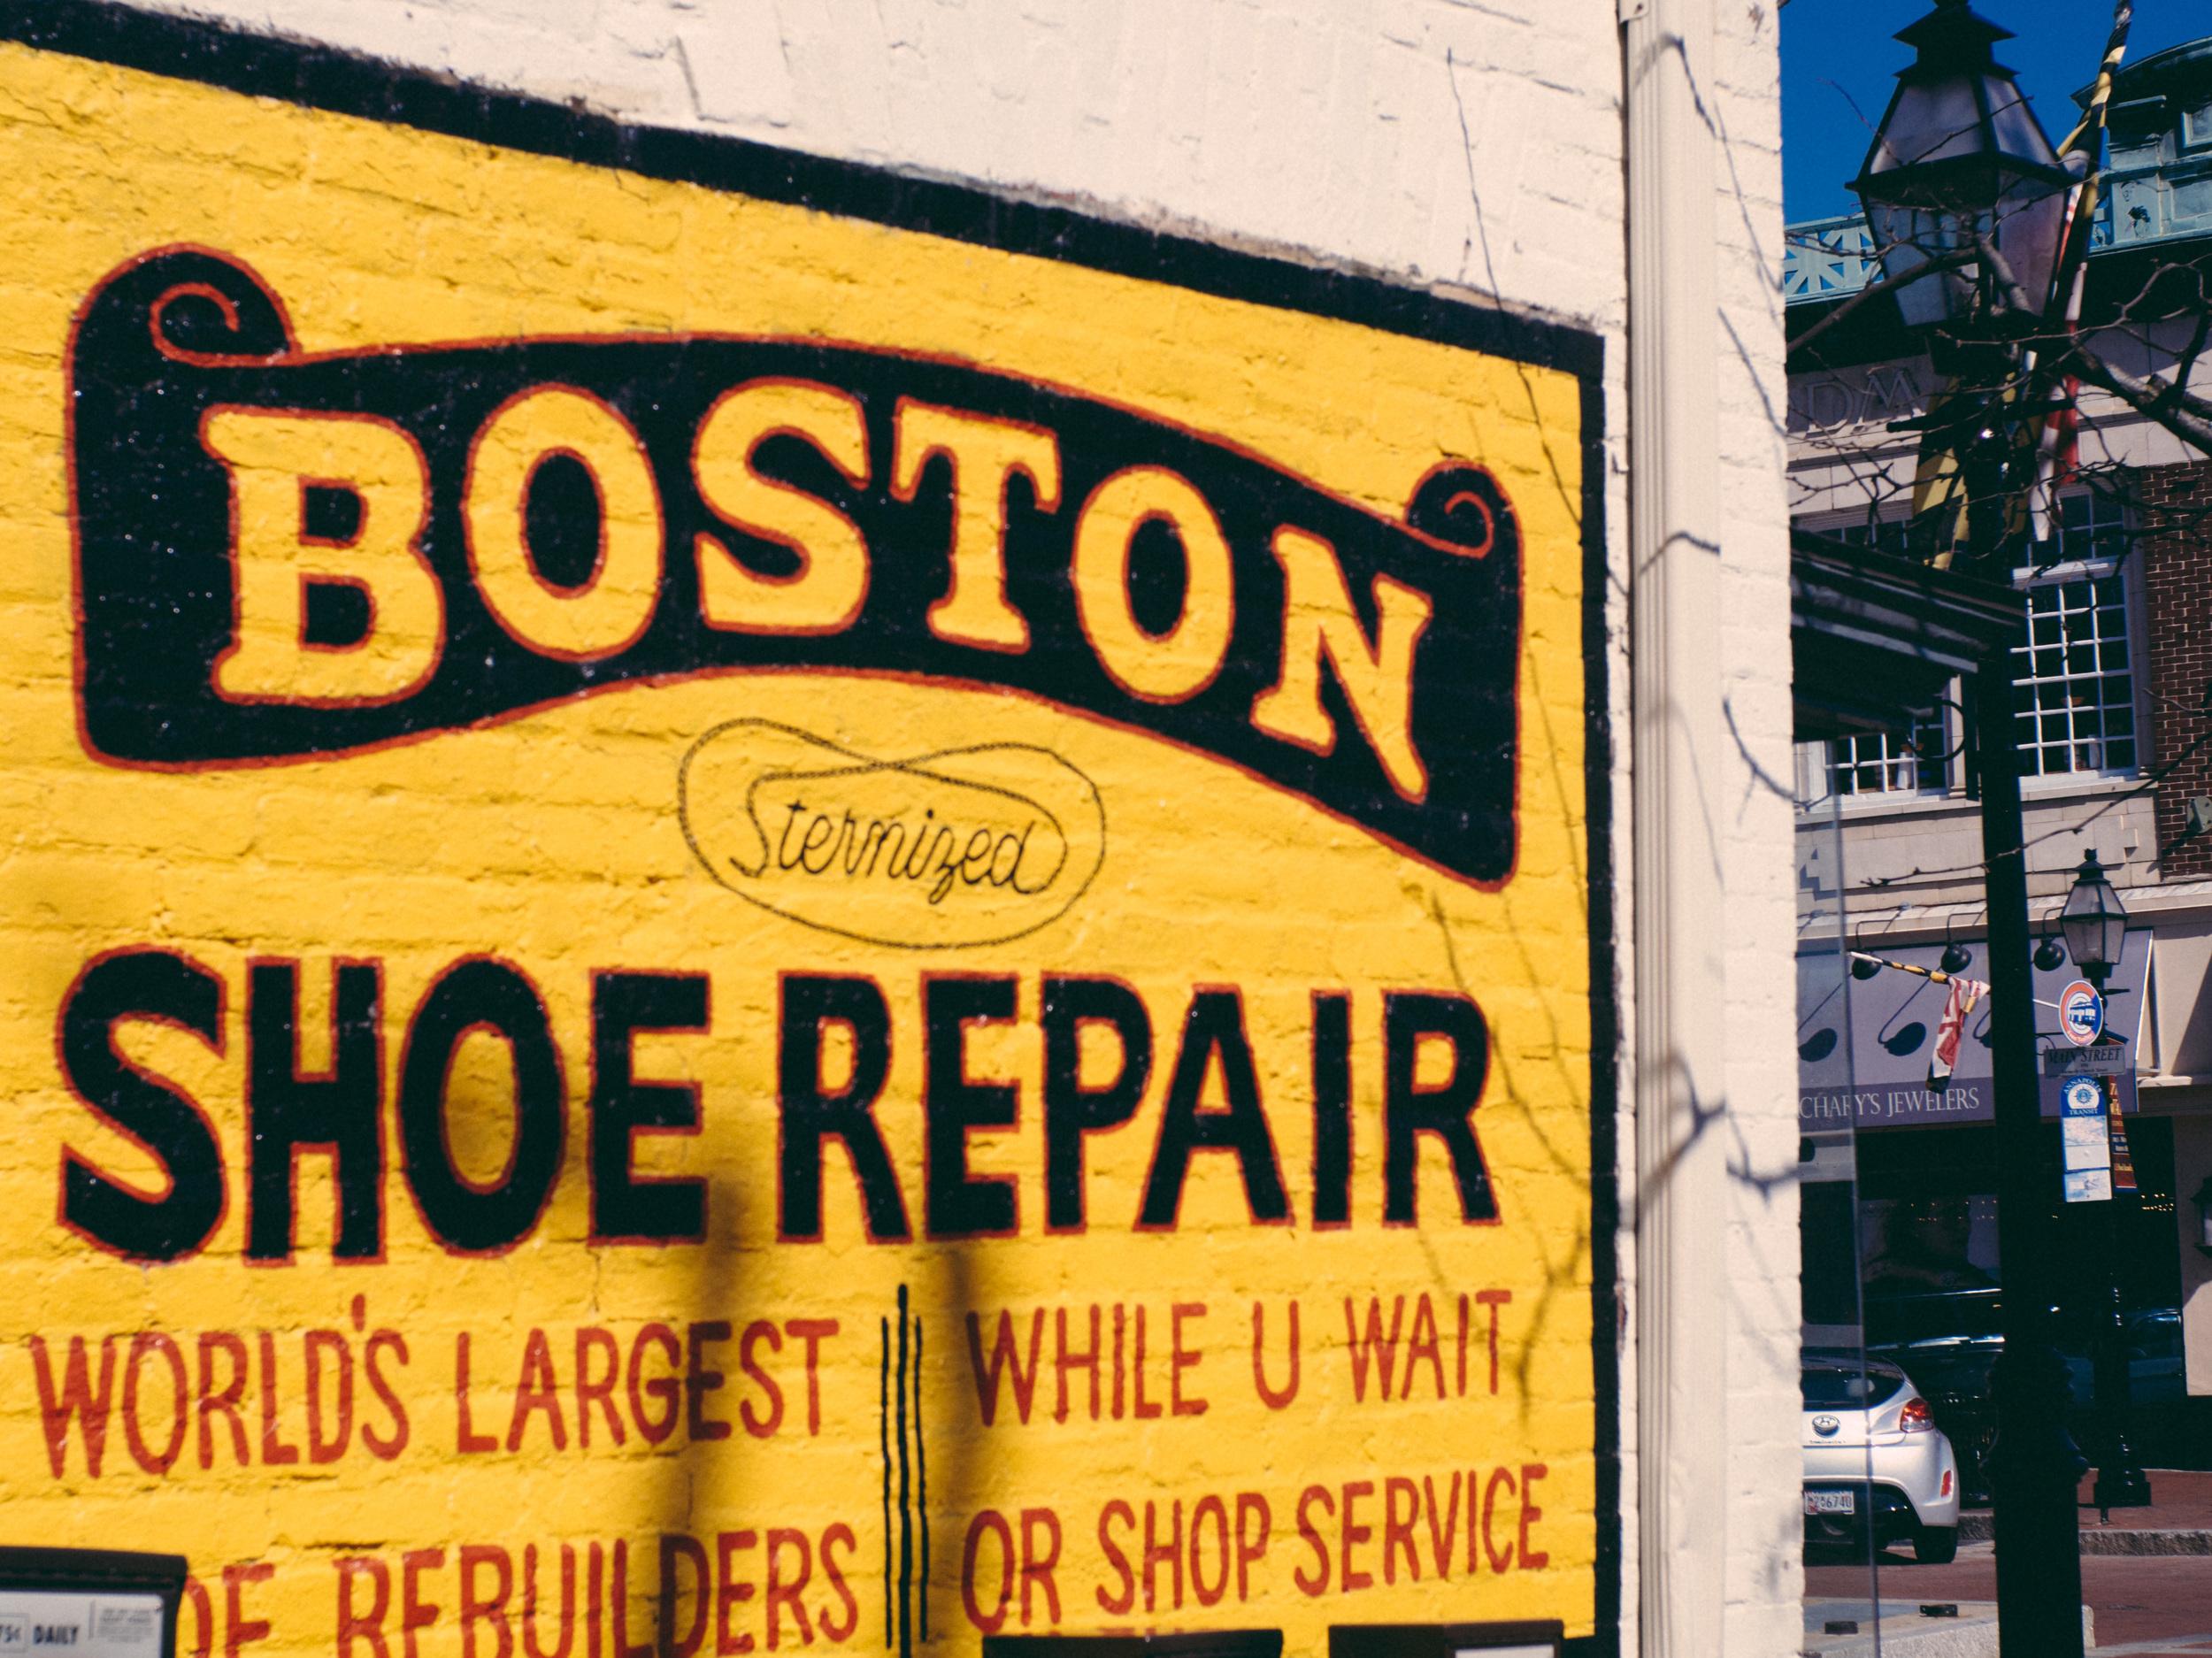 Boston Shoe Repair - Olympus OM-D, Voigtlander Nokton 35mm - ISO 200, f/4.0, 1/1000sec